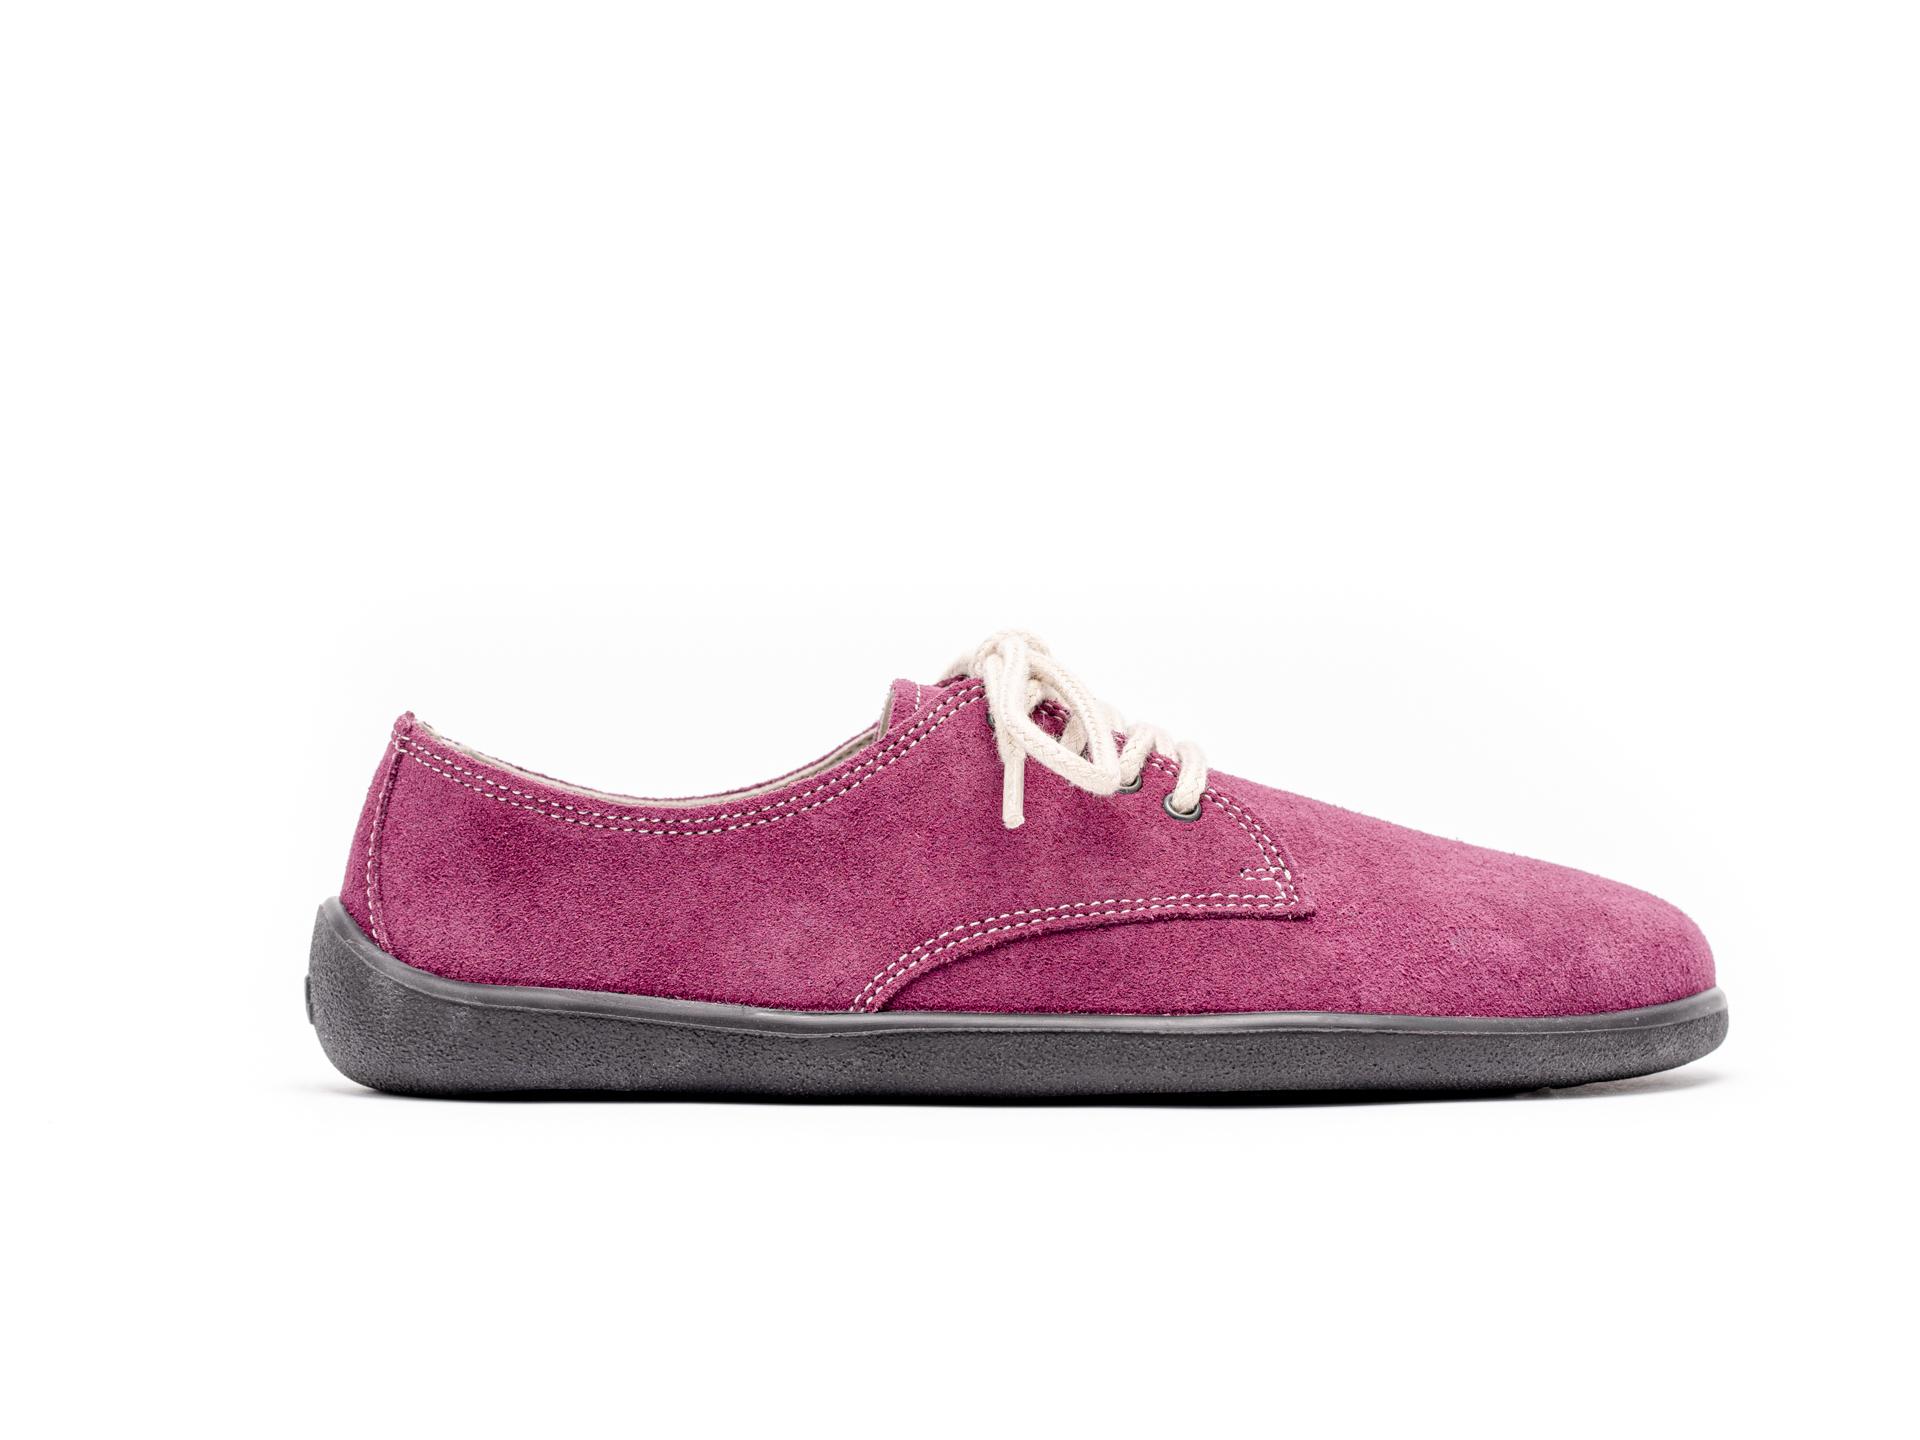 Barefoot Shoes - Be Lenka City - Plum 39